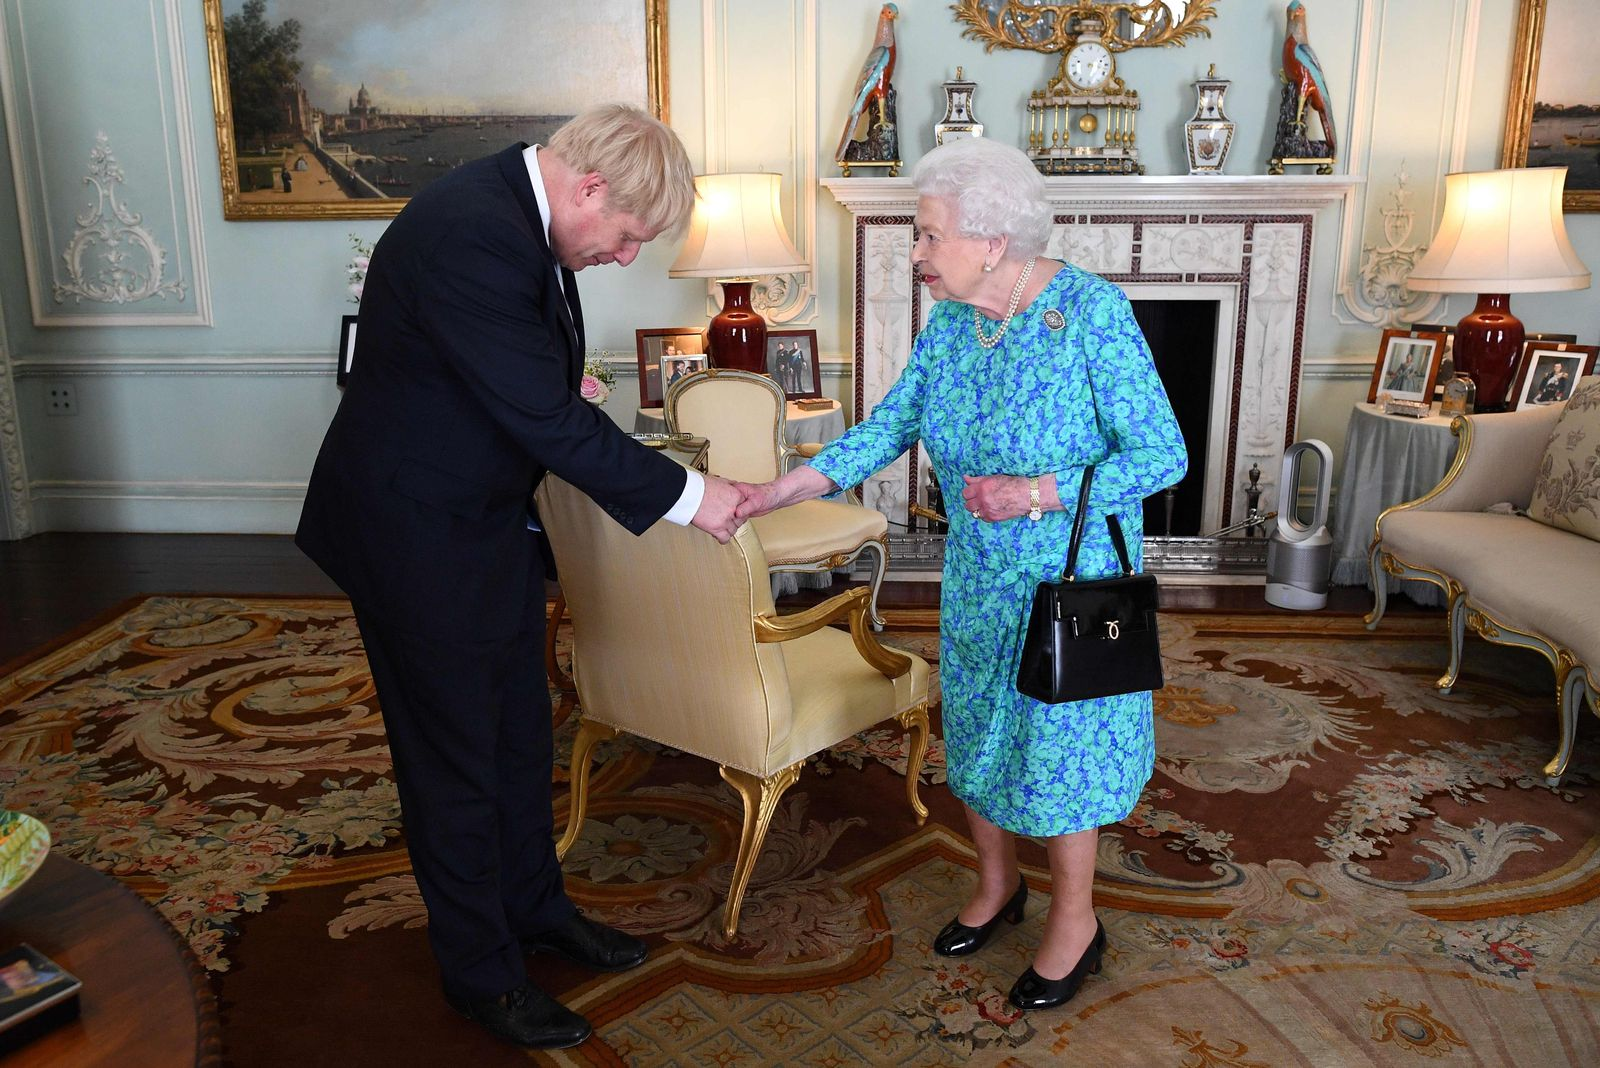 Queen Elizabeth II/ Boris Johnson